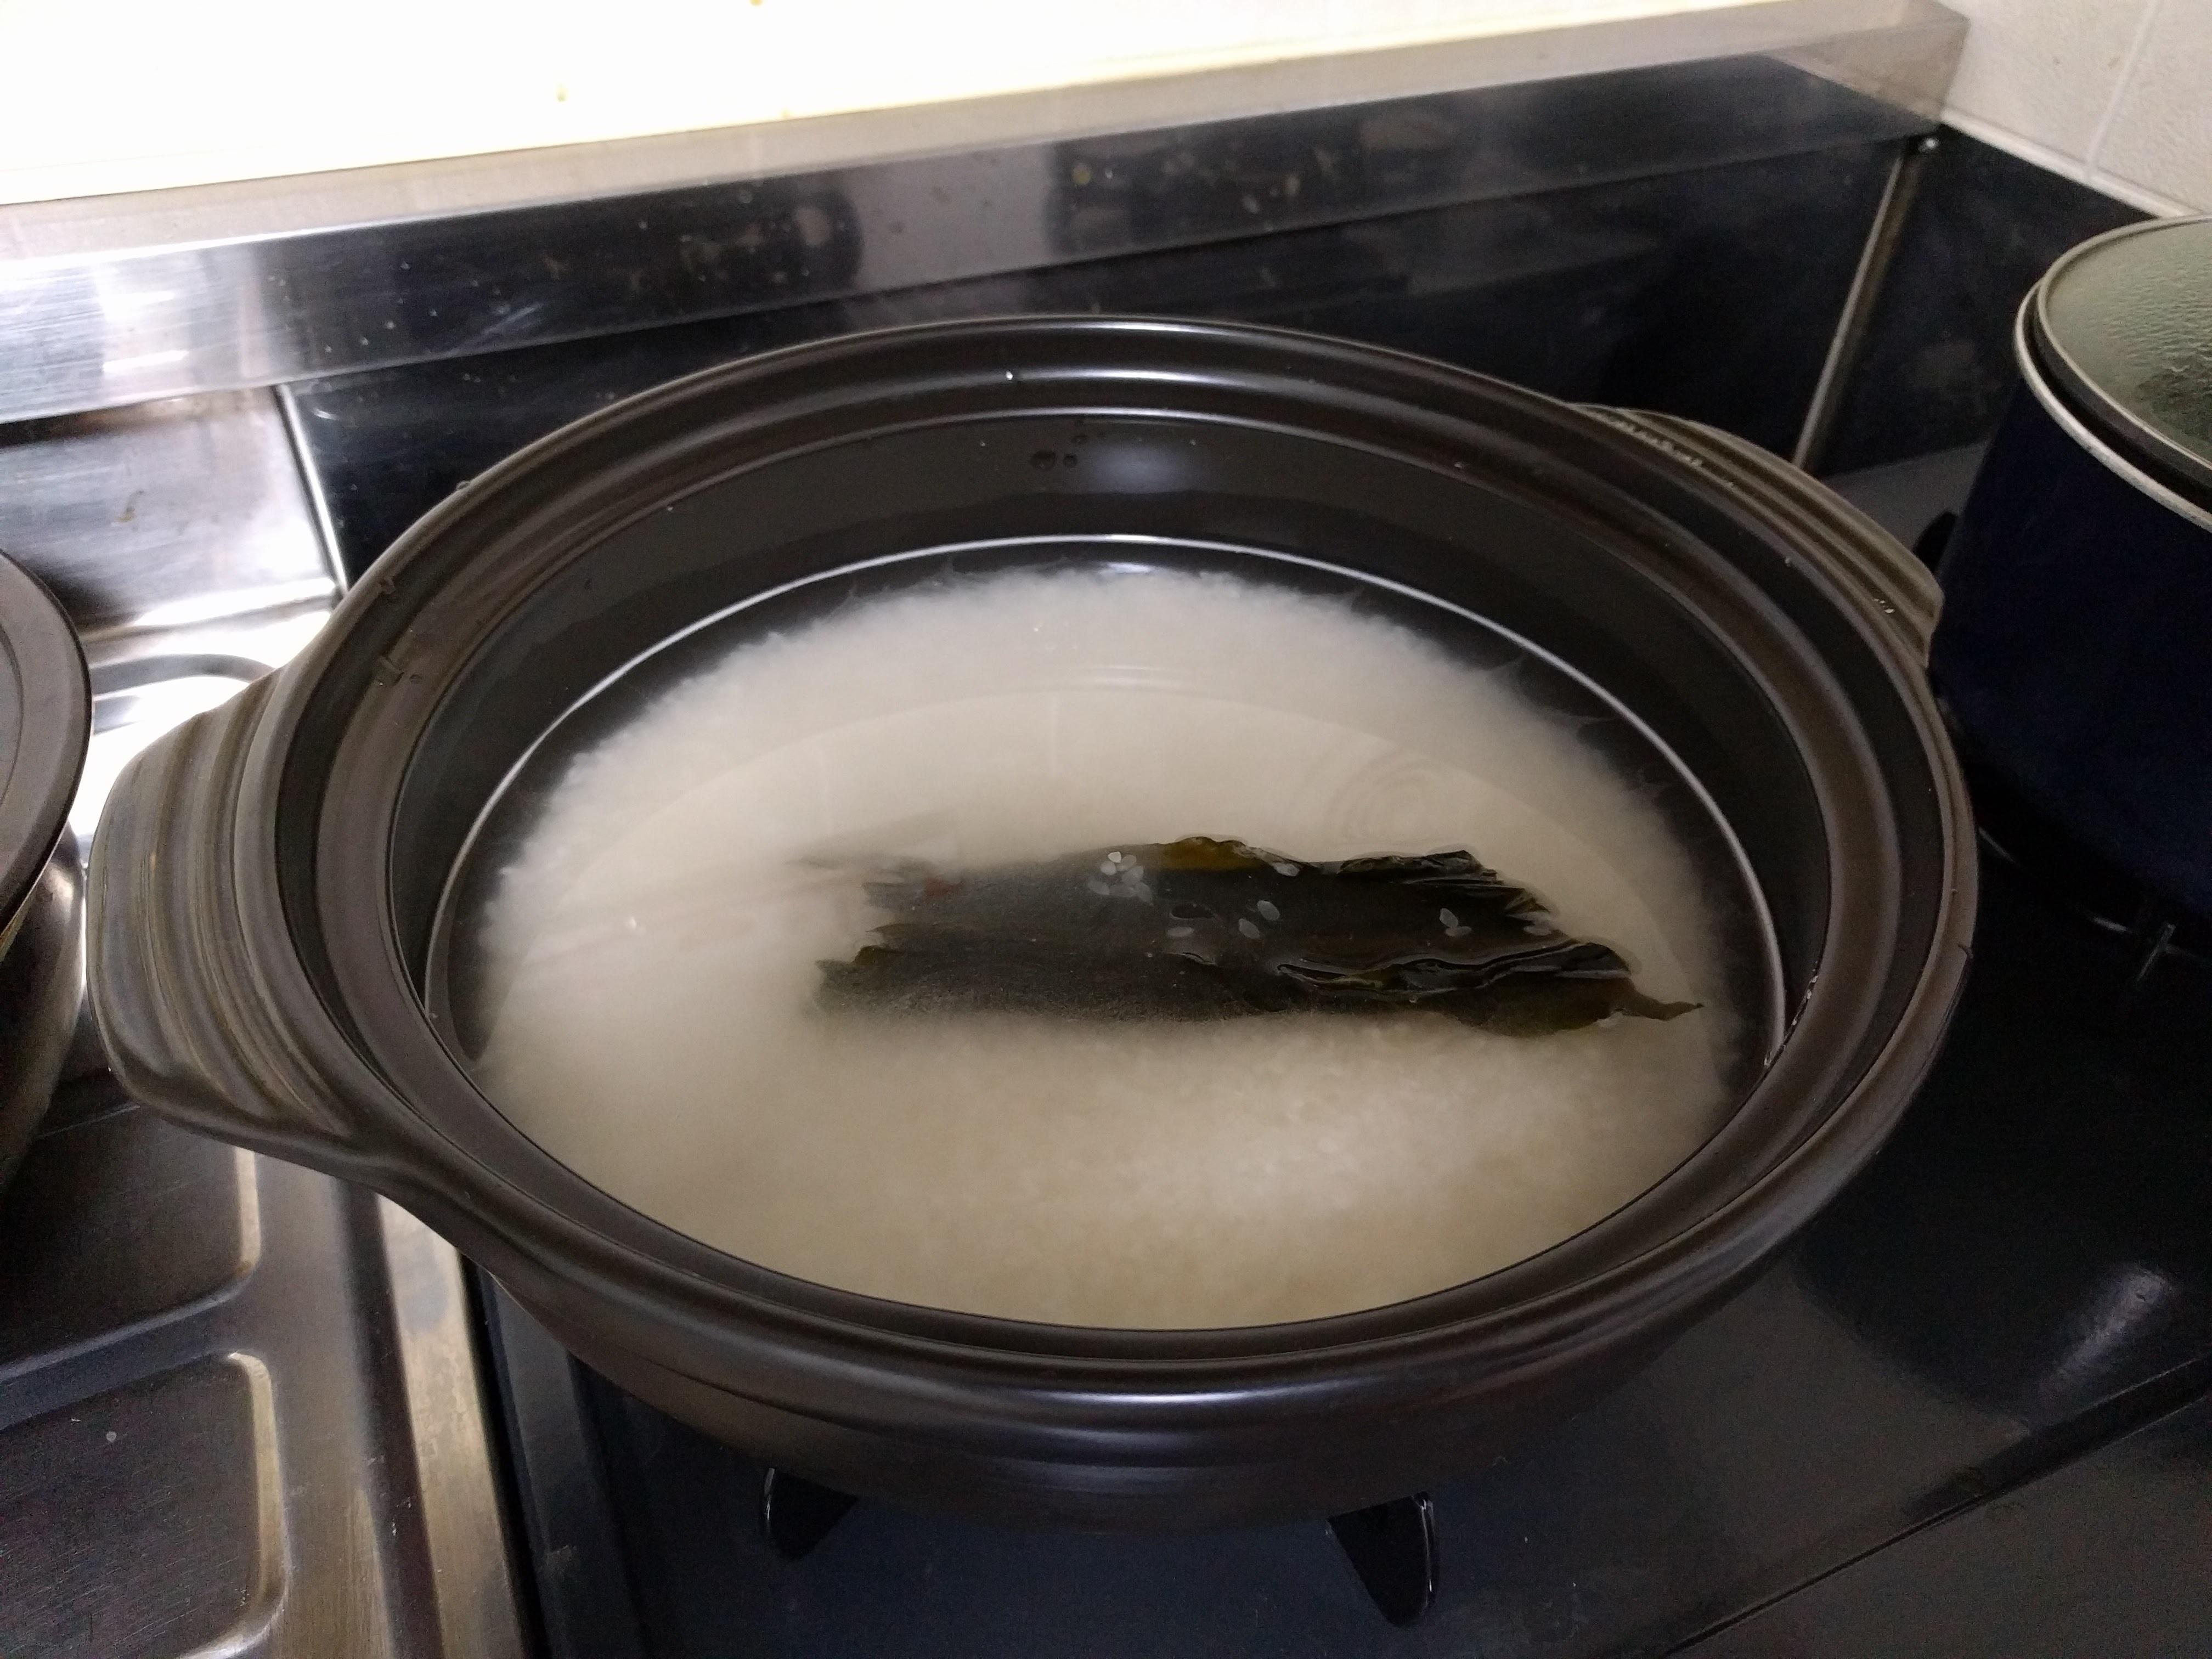 土鍋で炊飯準備状態